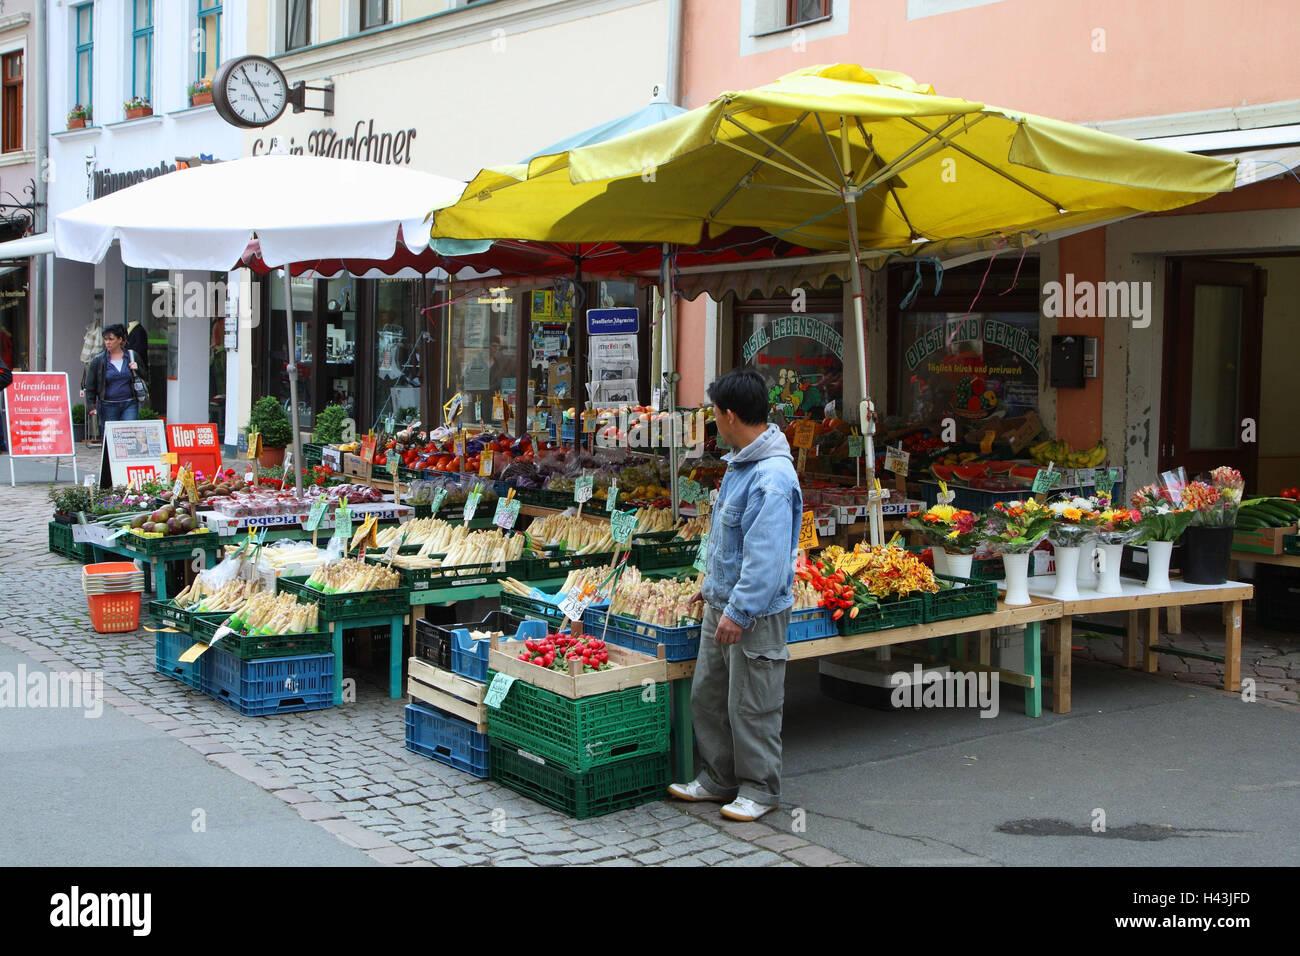 Germany, Saxon Switzerland, Pirna, Old Town, greengrocery, - Stock Image